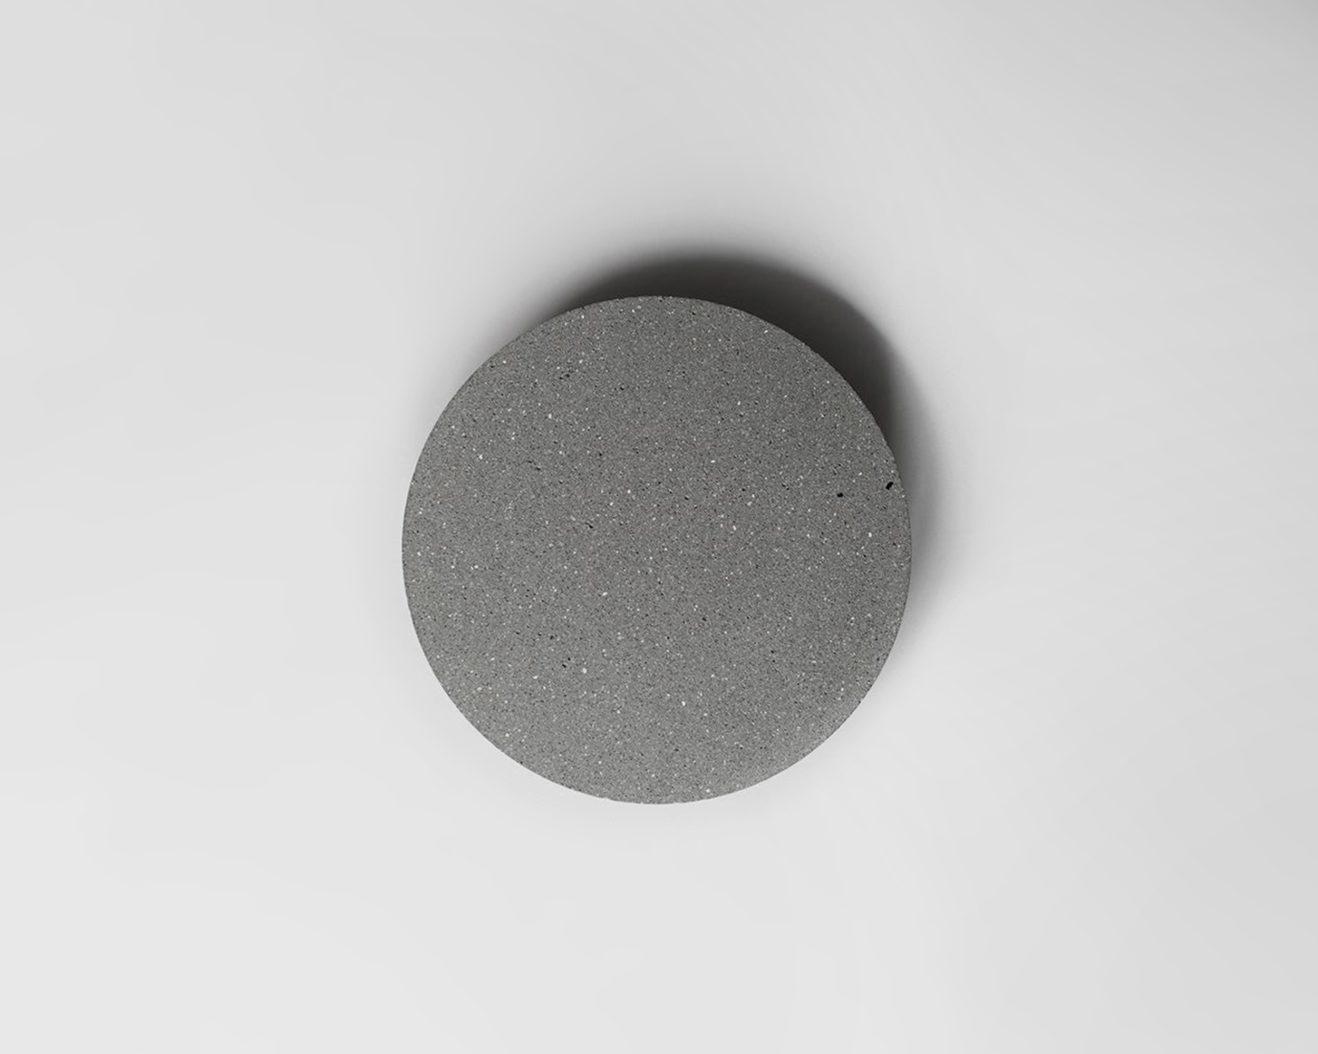 Bentu-Pin-Sconces-Wall-Lamp-Savannah-Bay-Gallery